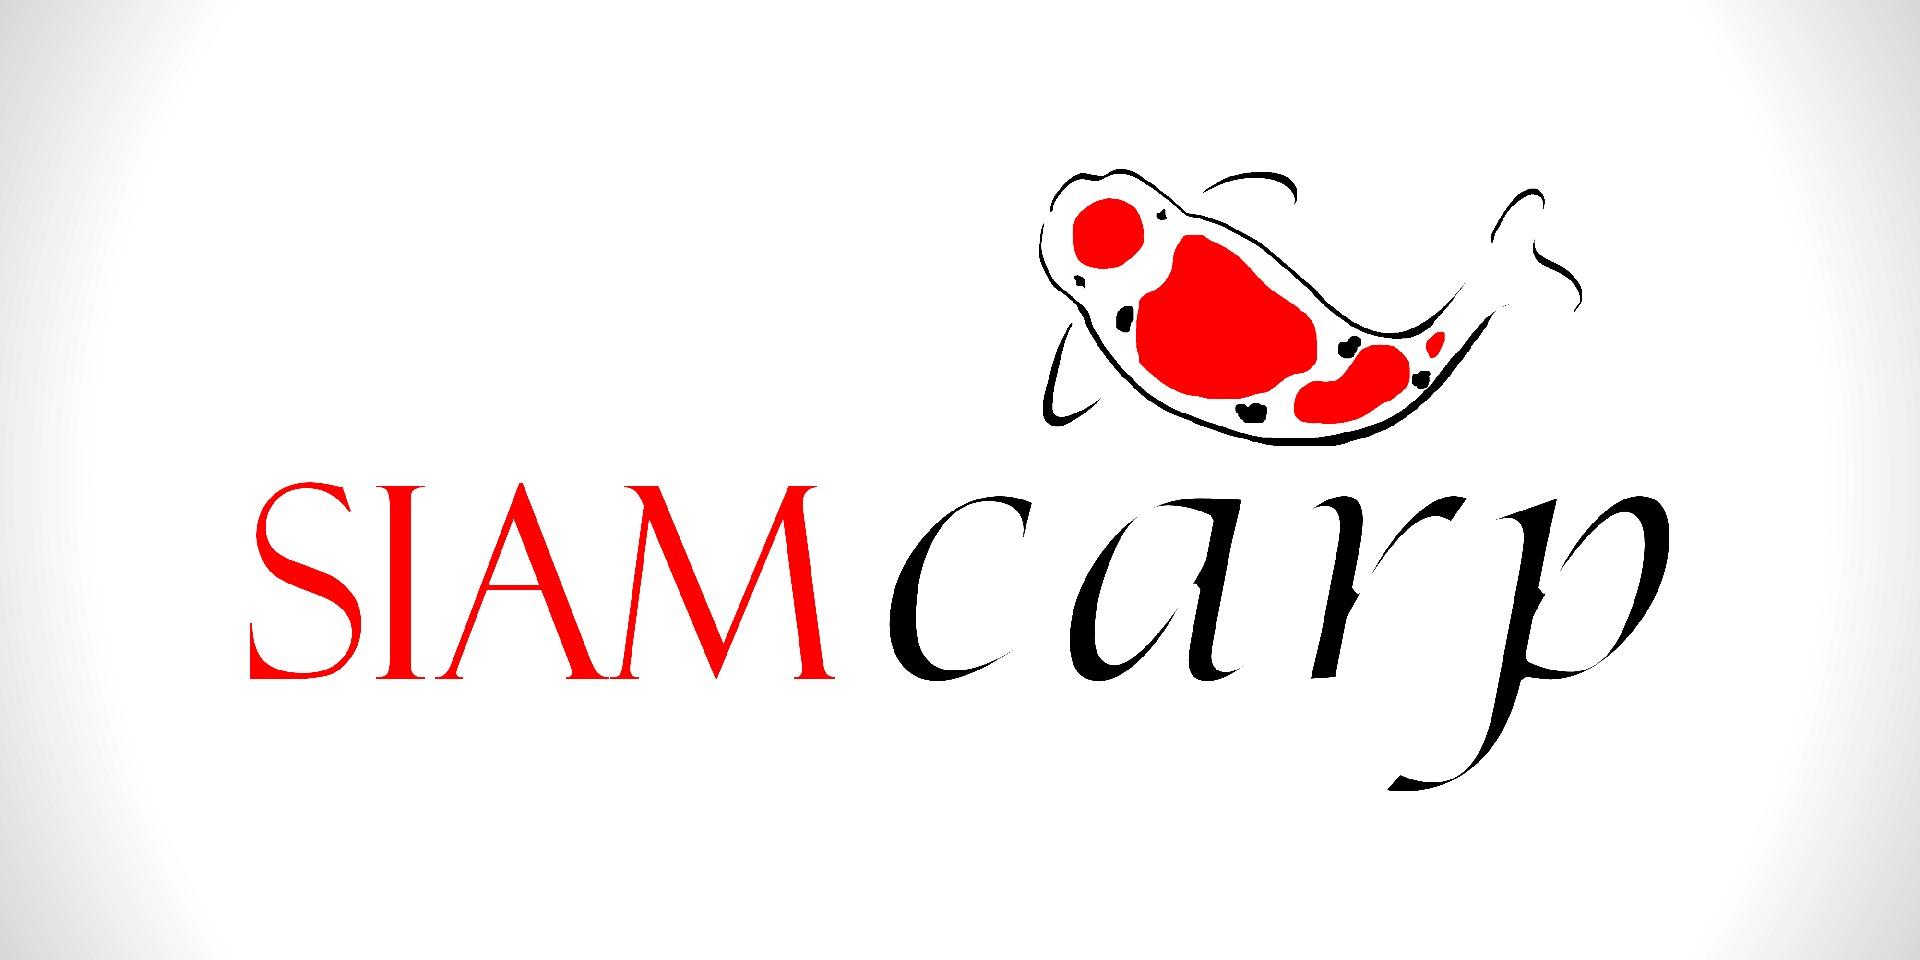 Siamcarp